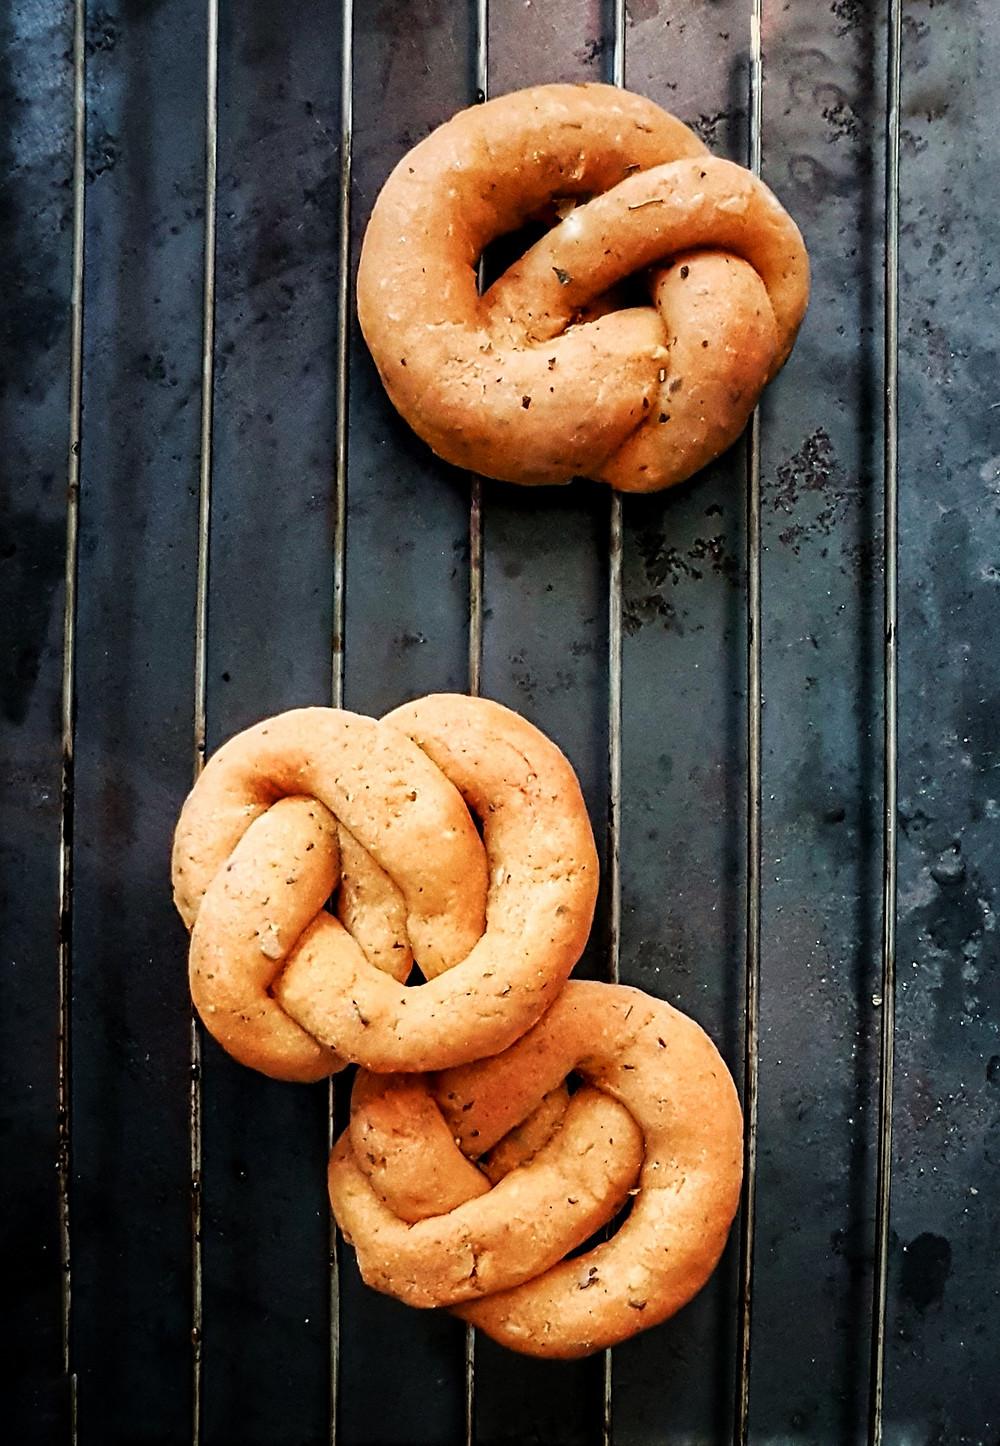 Gluten Free and Vegan Garlic Knots